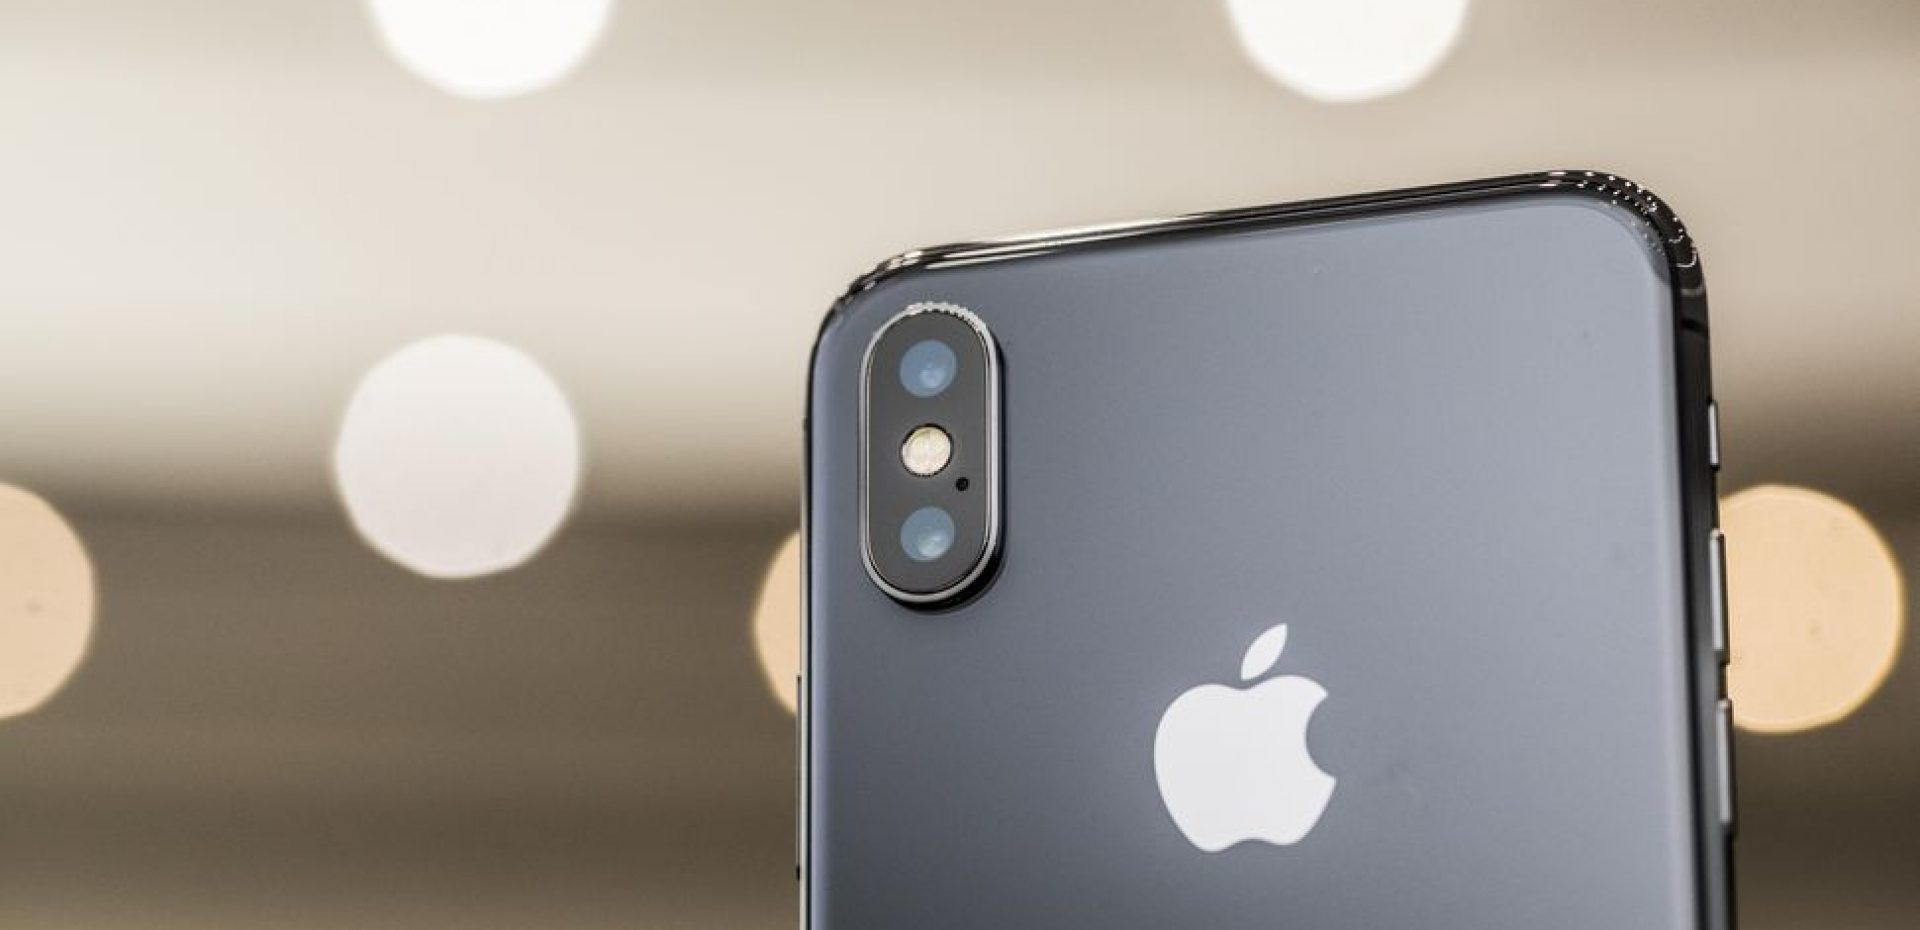 تعمیر آیفون XS موبایل اپل ایکس اس | گارانتی رسمی اپل